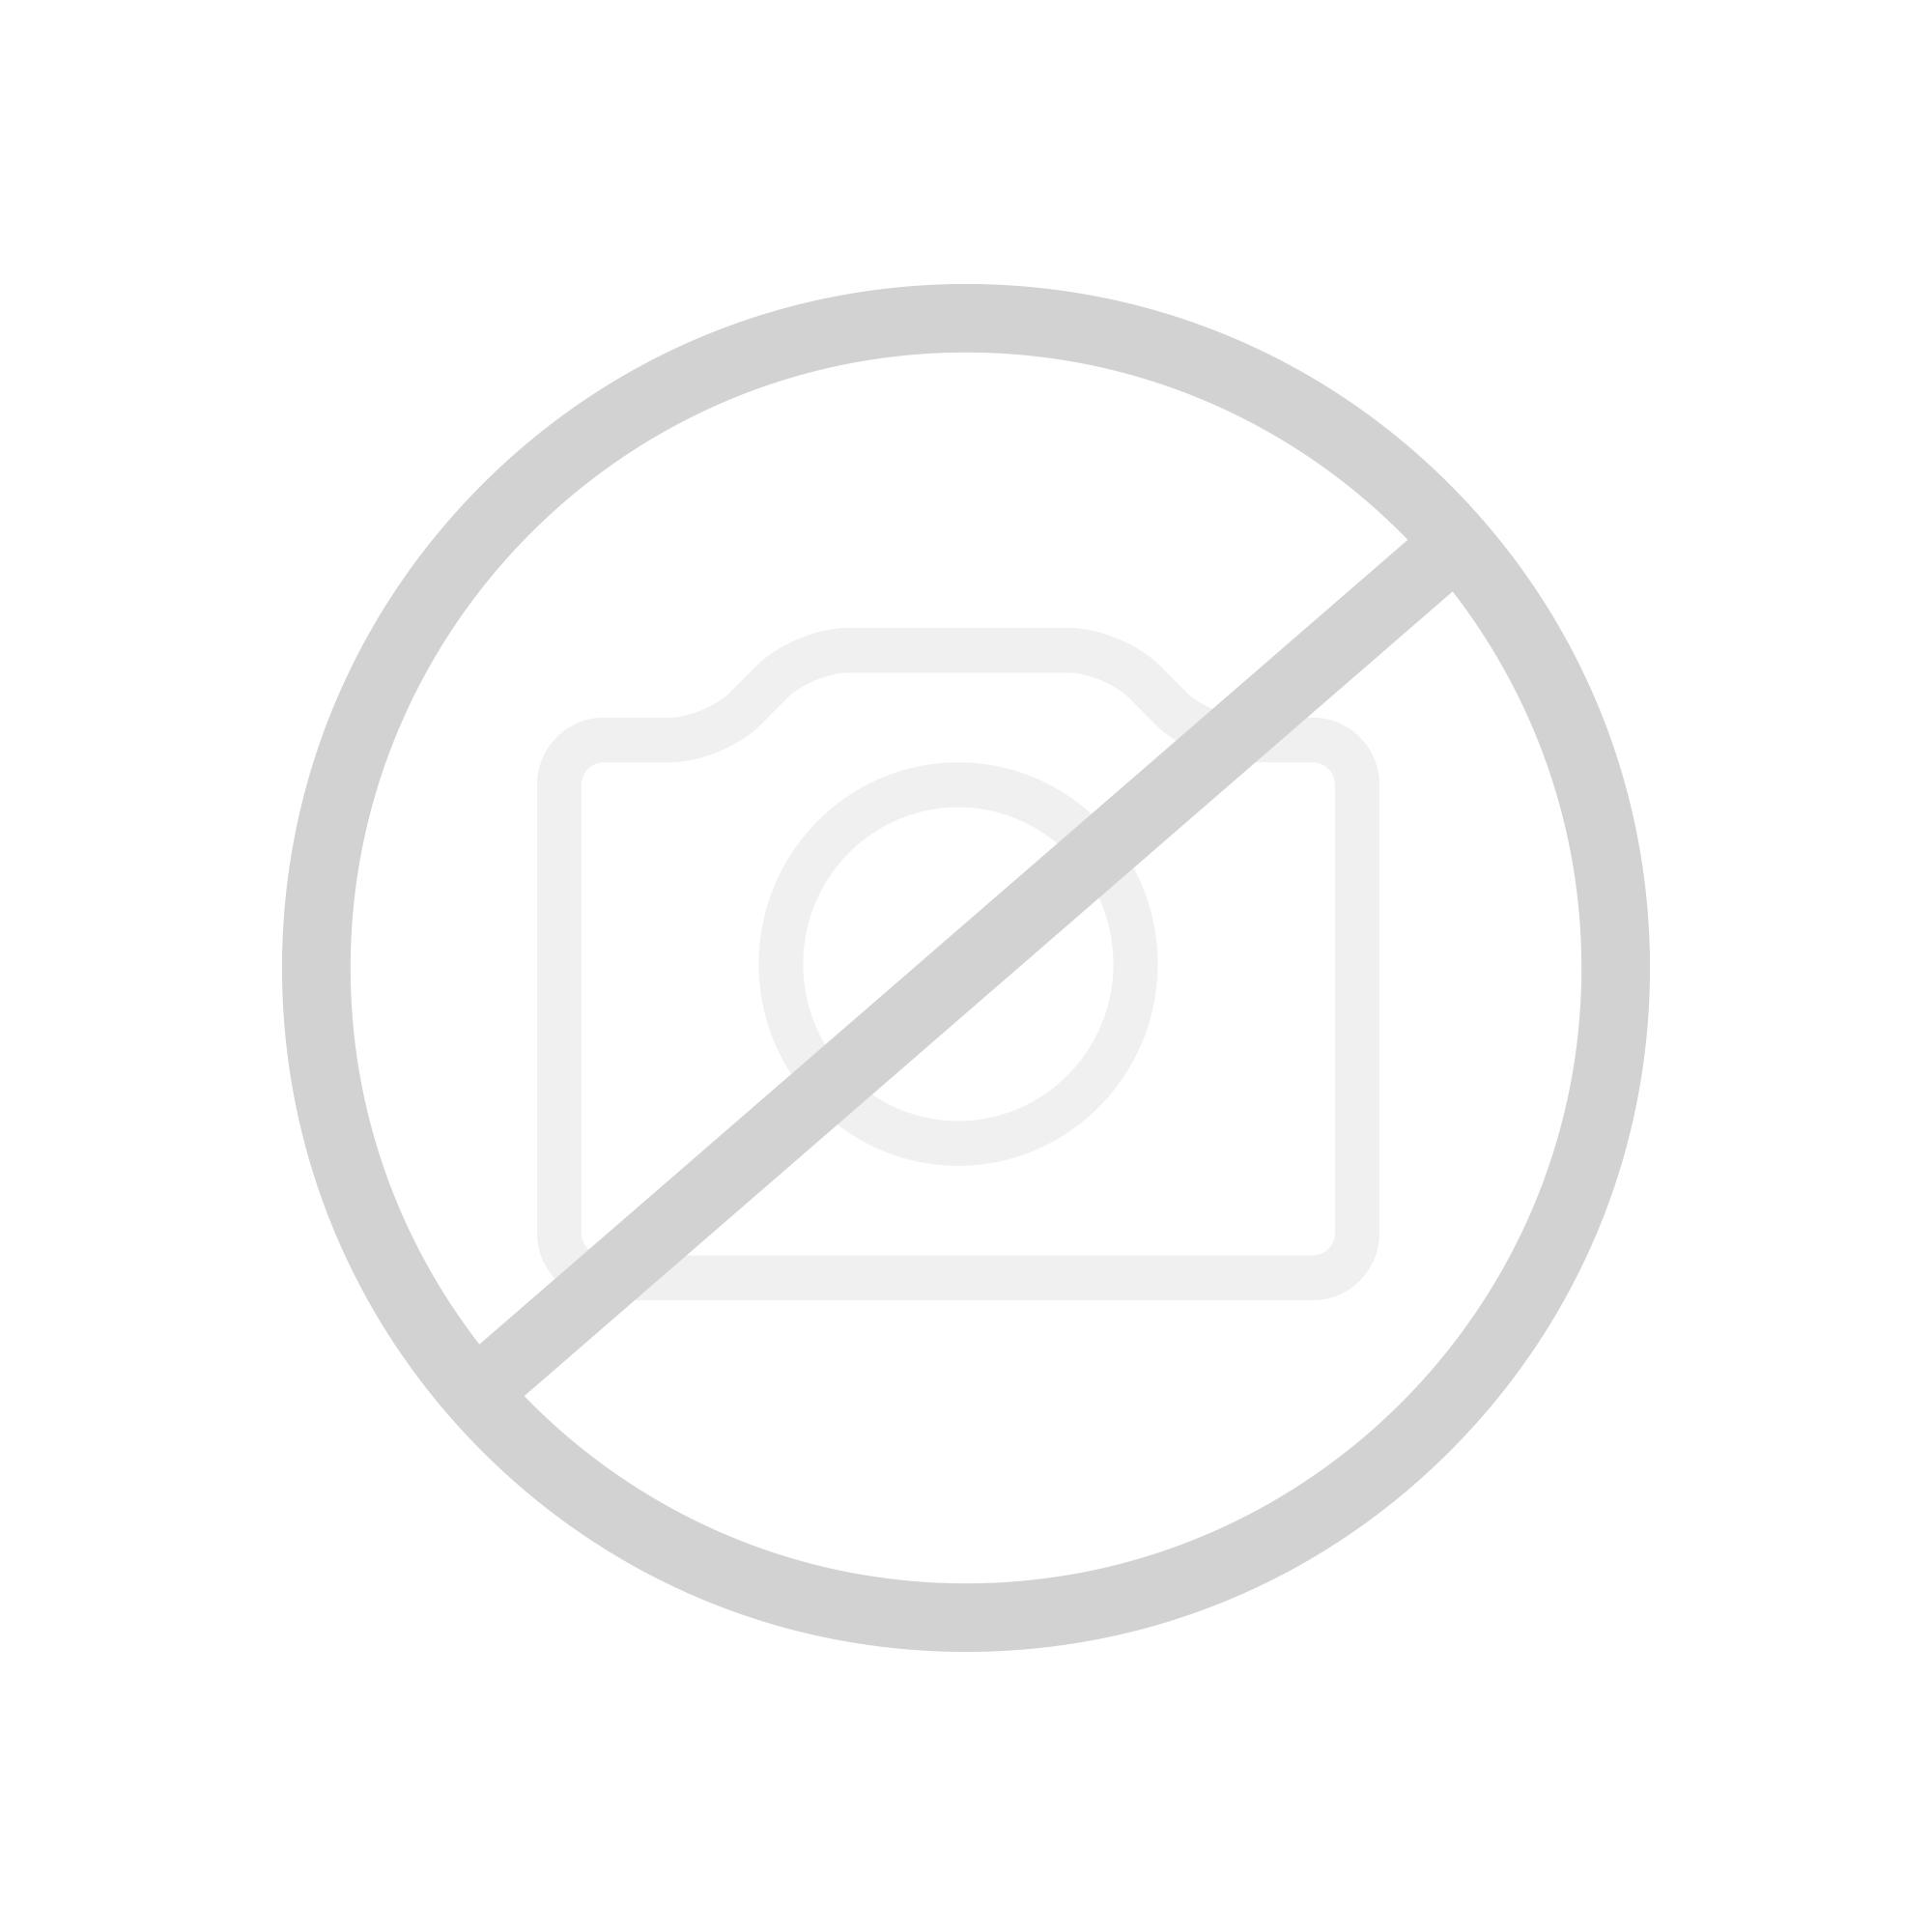 Hansgrohe Croma 160 Showerpipe, DN 15